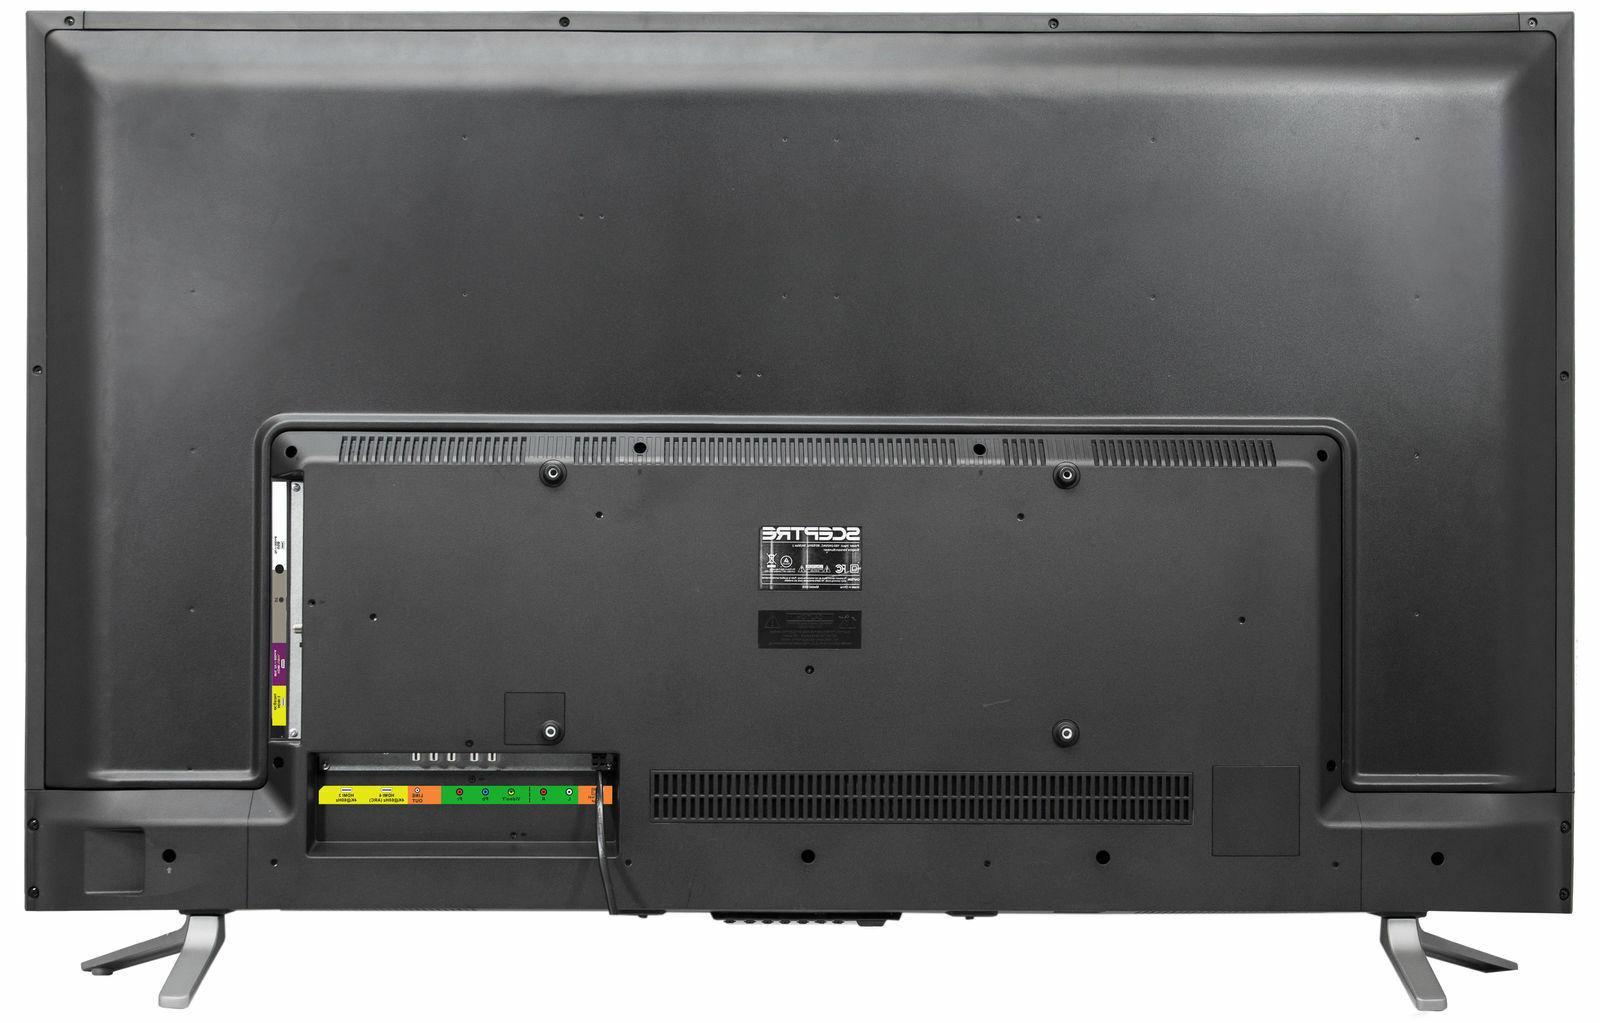 55 inch HD TV Flat HZ 2160p